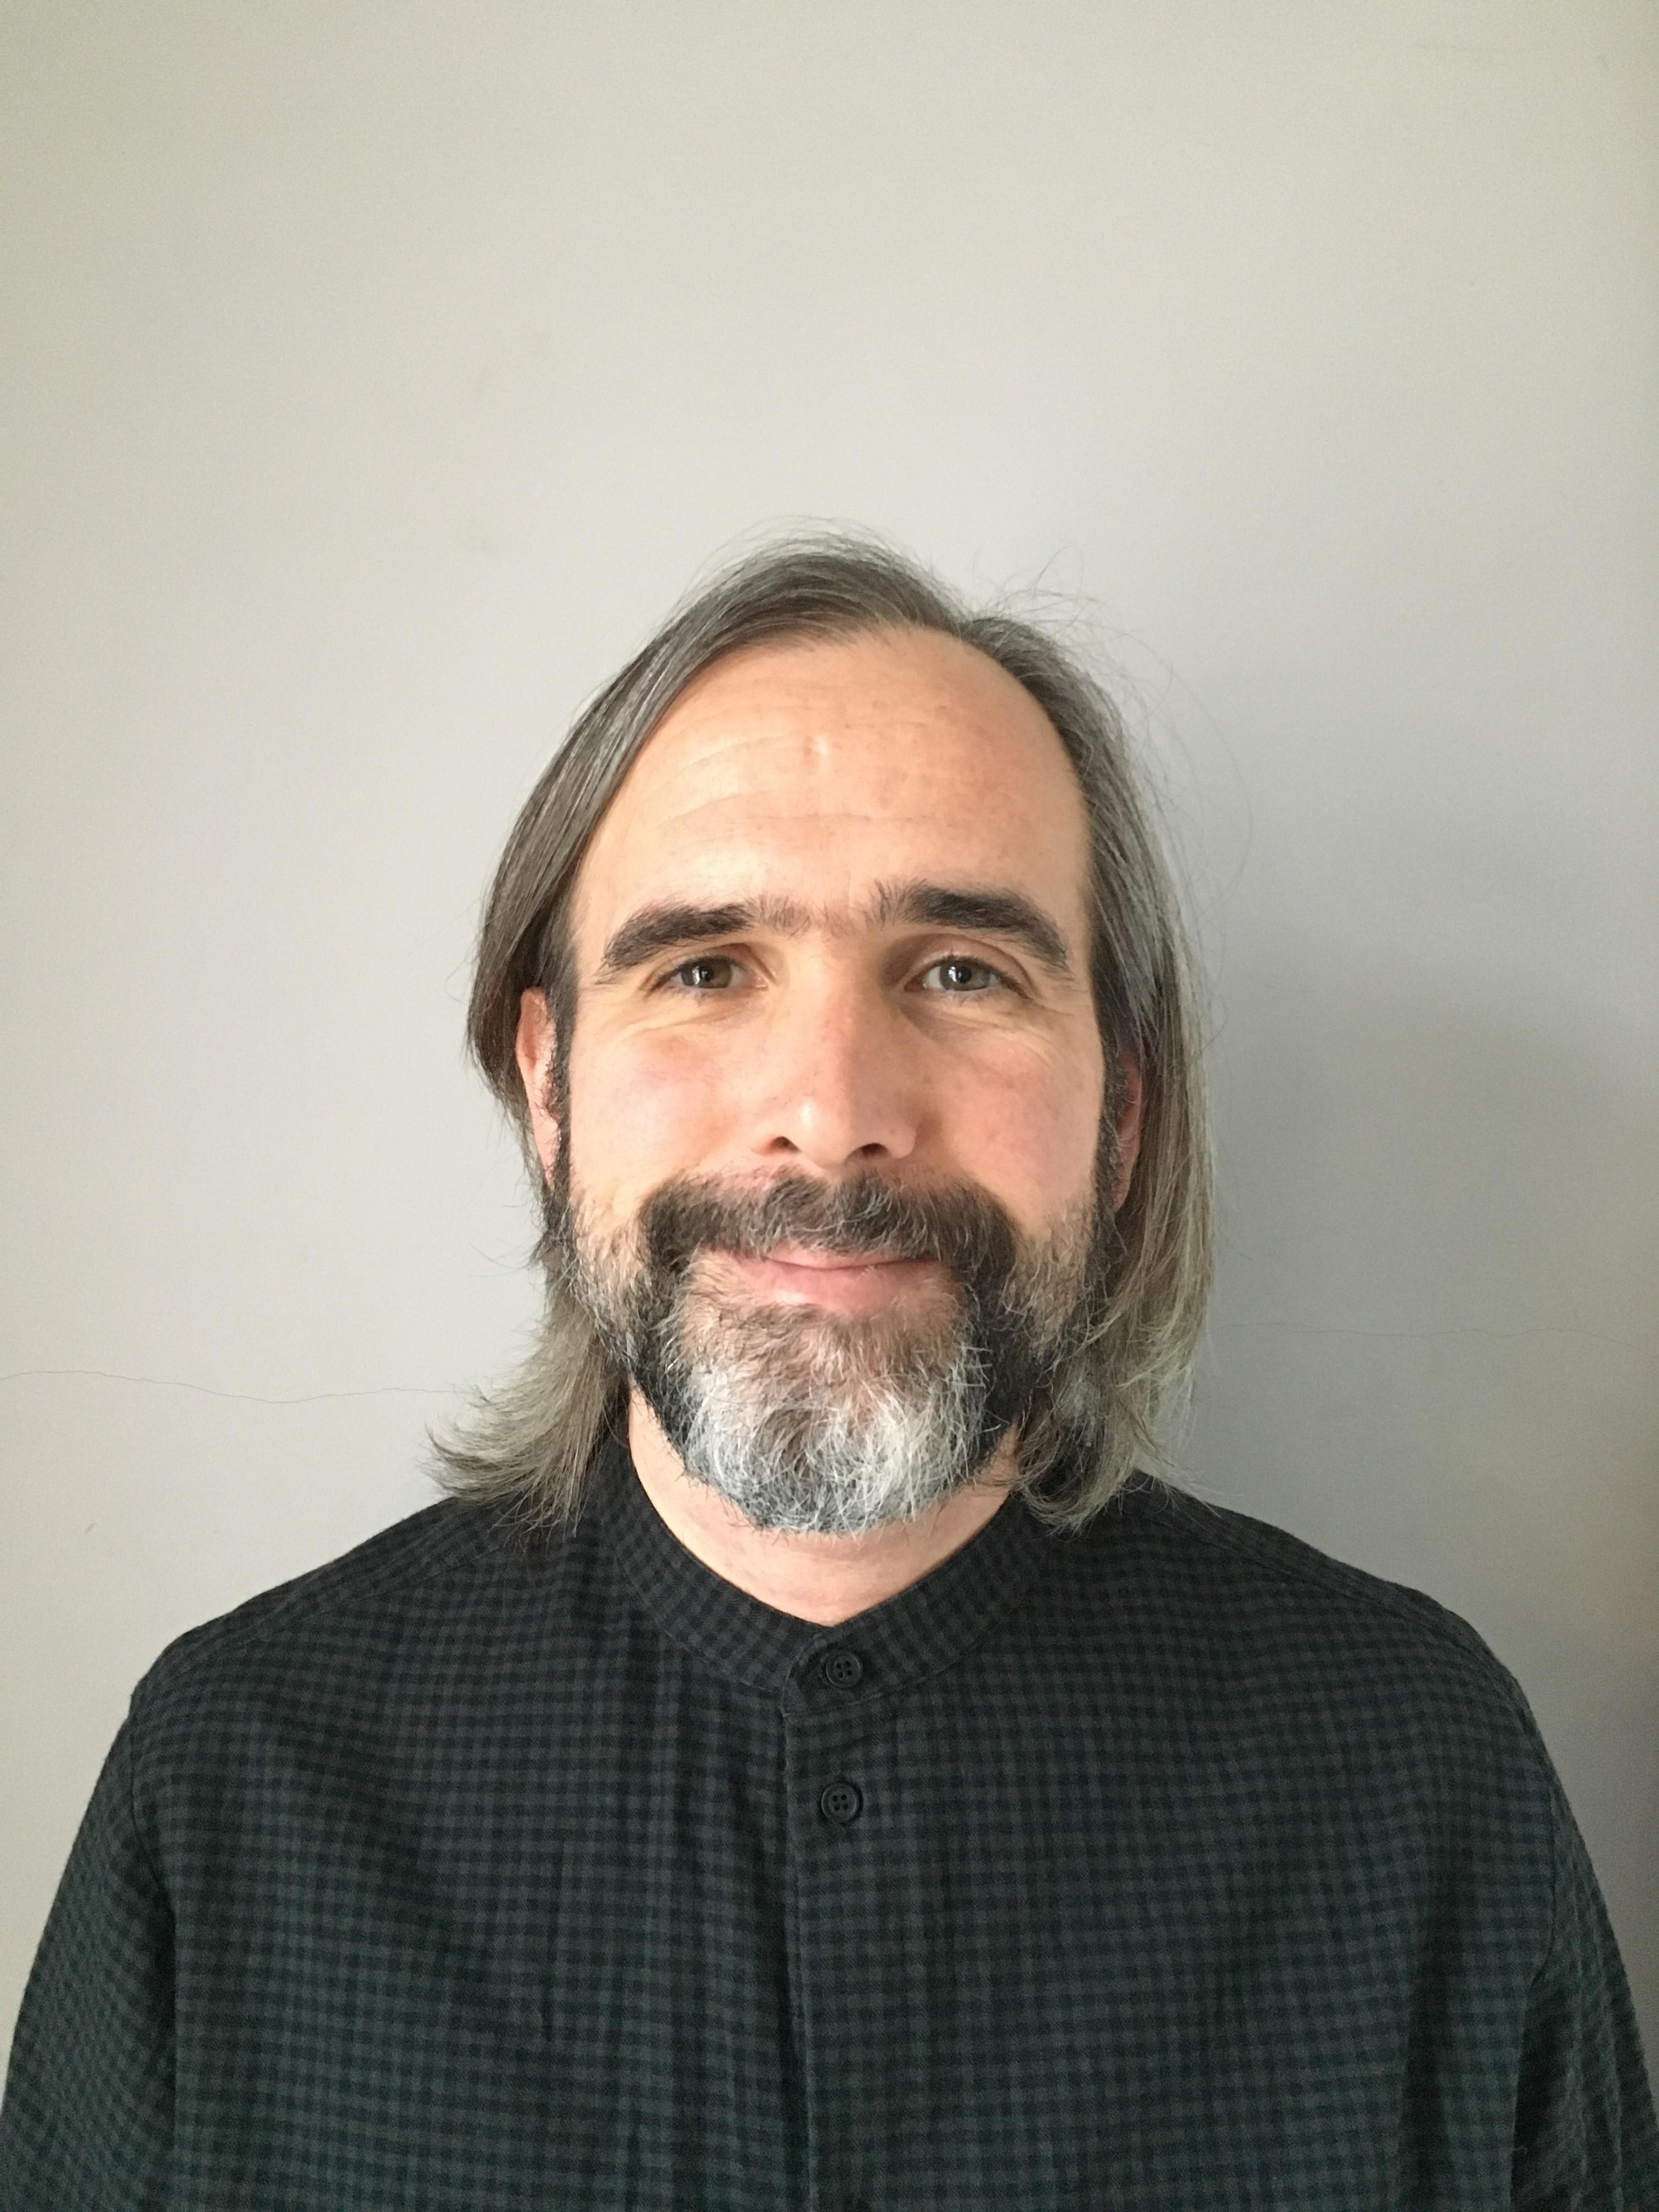 Robert Ferreira